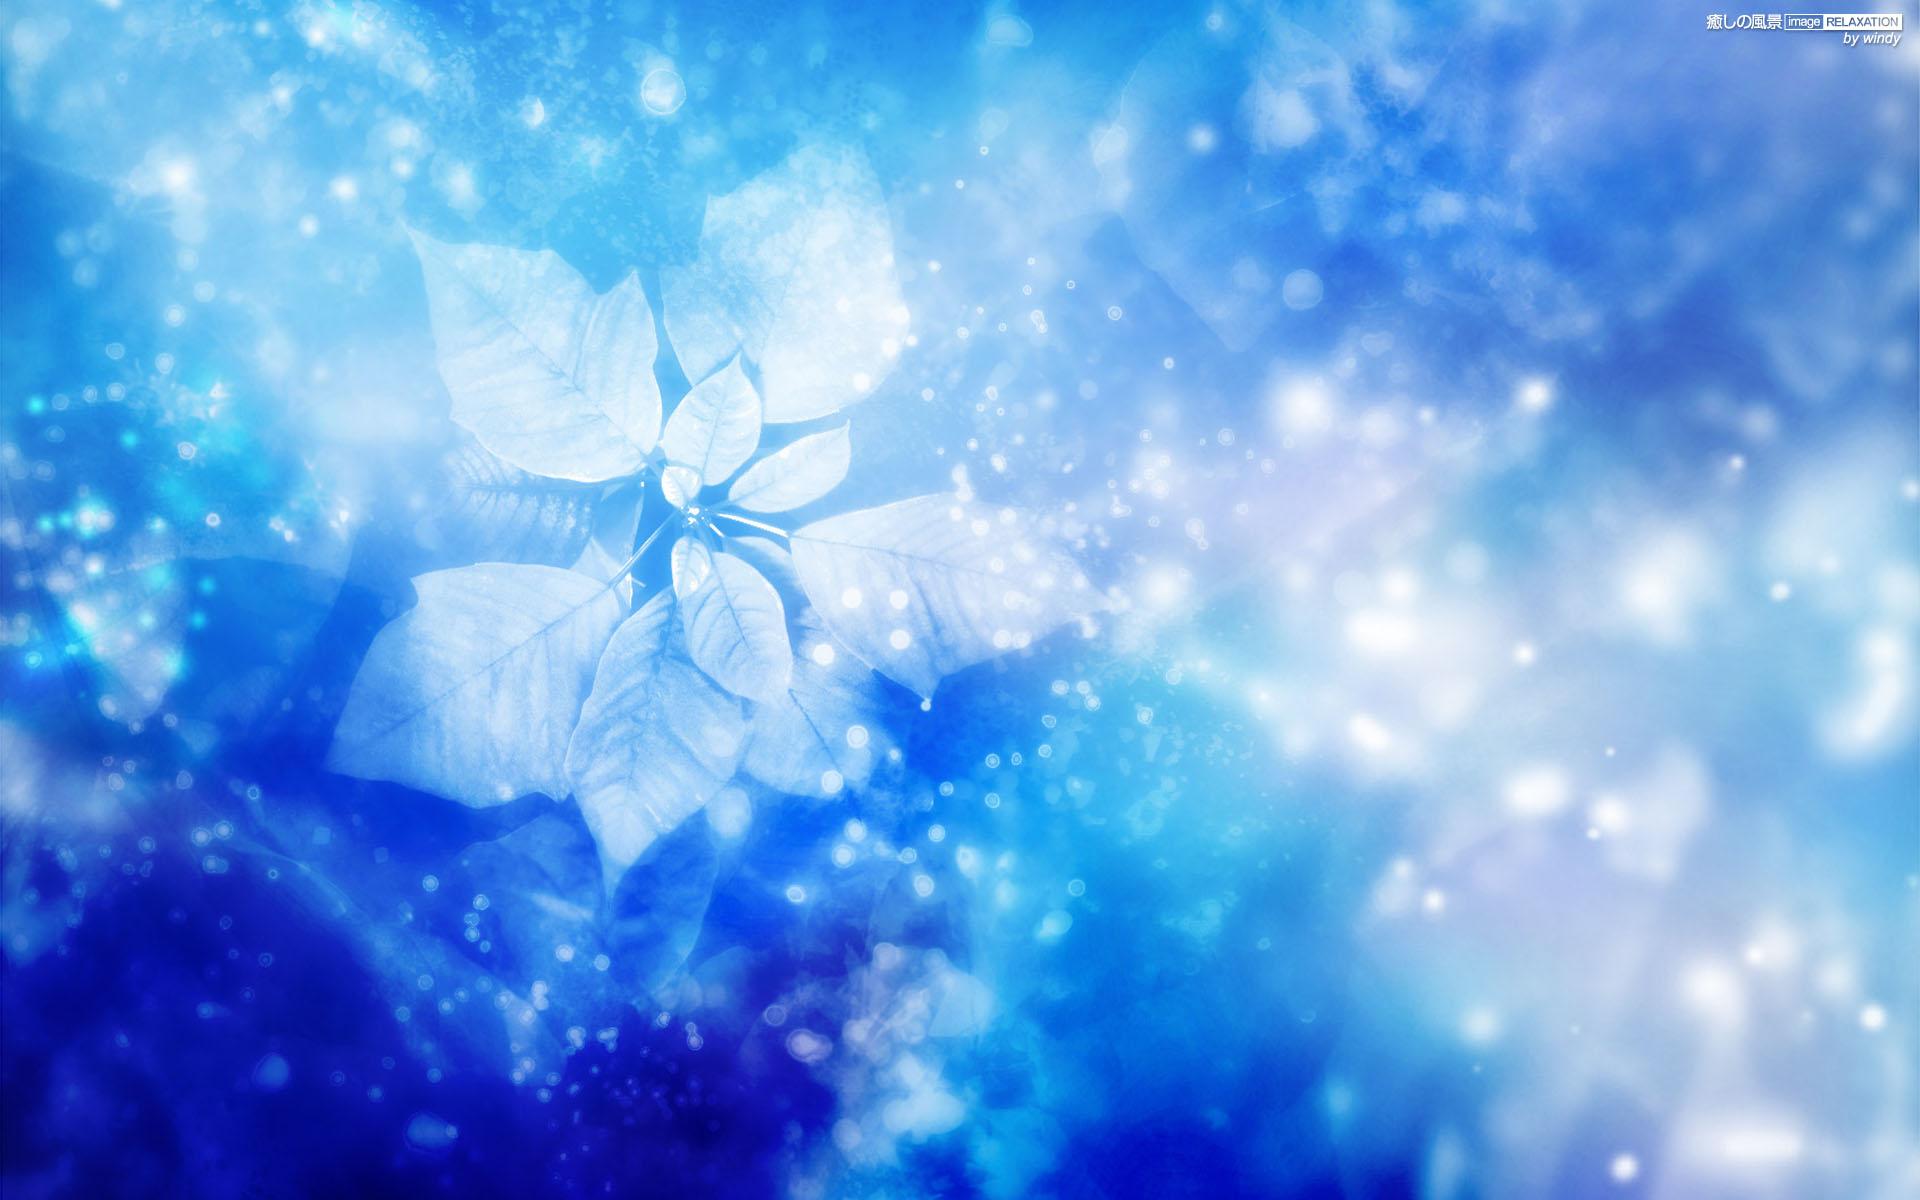 3d Design Flower Wallpaper ポインセチア 壁紙(ブルー系)